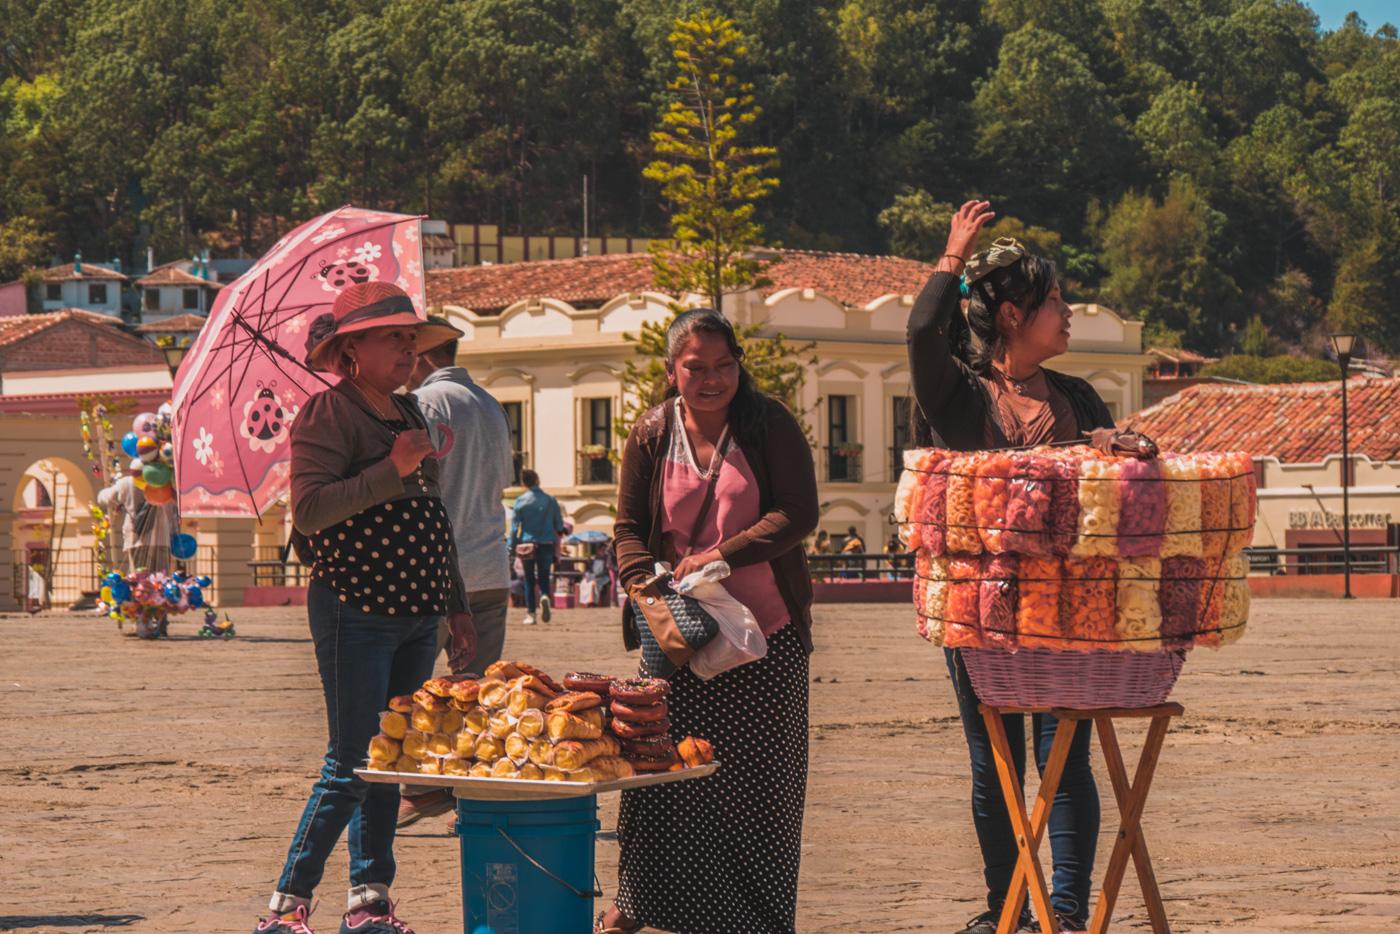 Straßenverkäufer in San Cristobal de las Casas